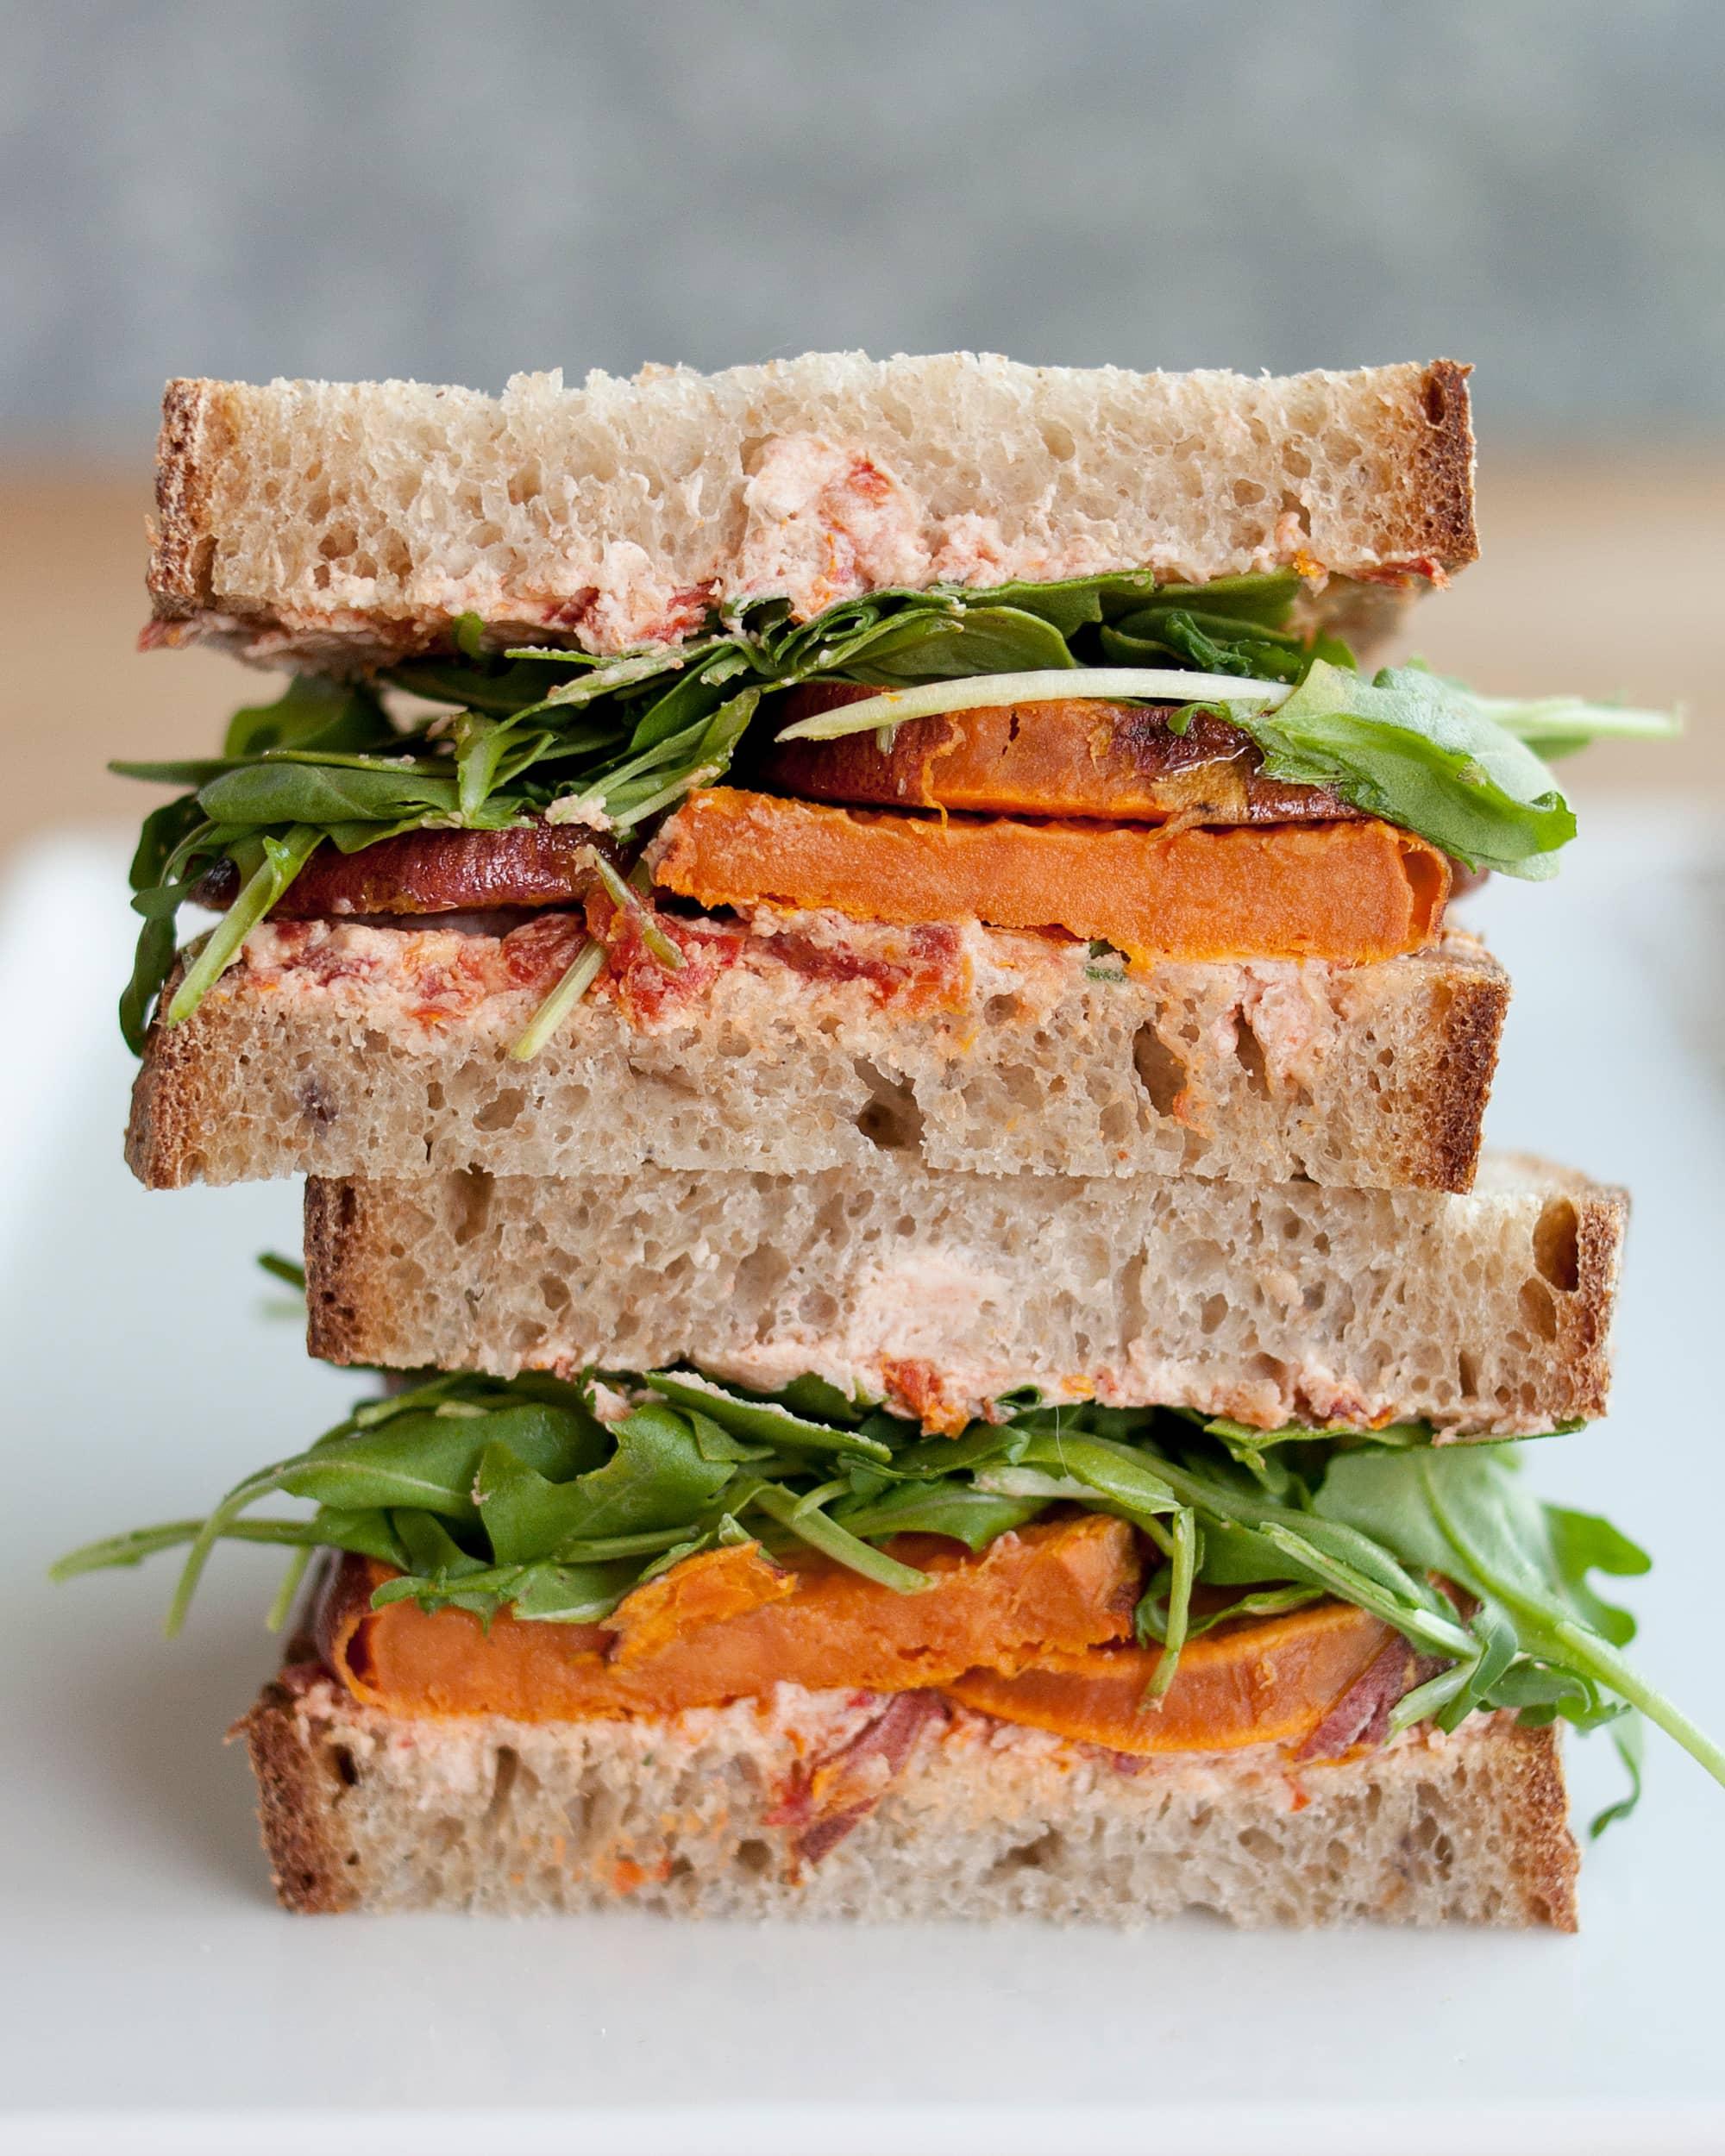 Recipe: Roasted Sweet Potato, Goat Cheese & Arugula Sandwiches